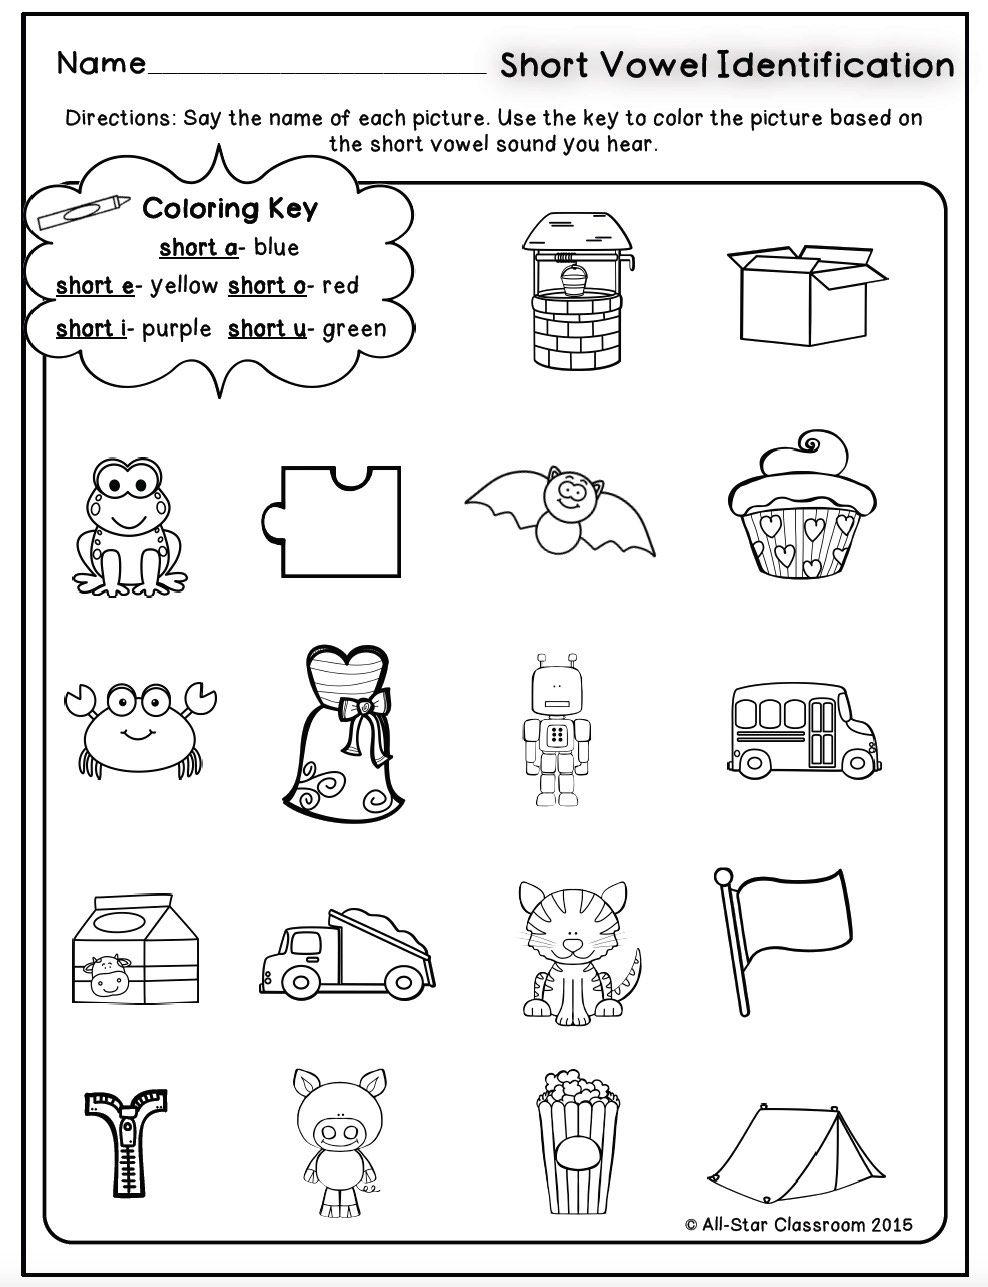 Short Vowels Identification Printables Sorts Short Vowels Vowel Short Vowel Sounds